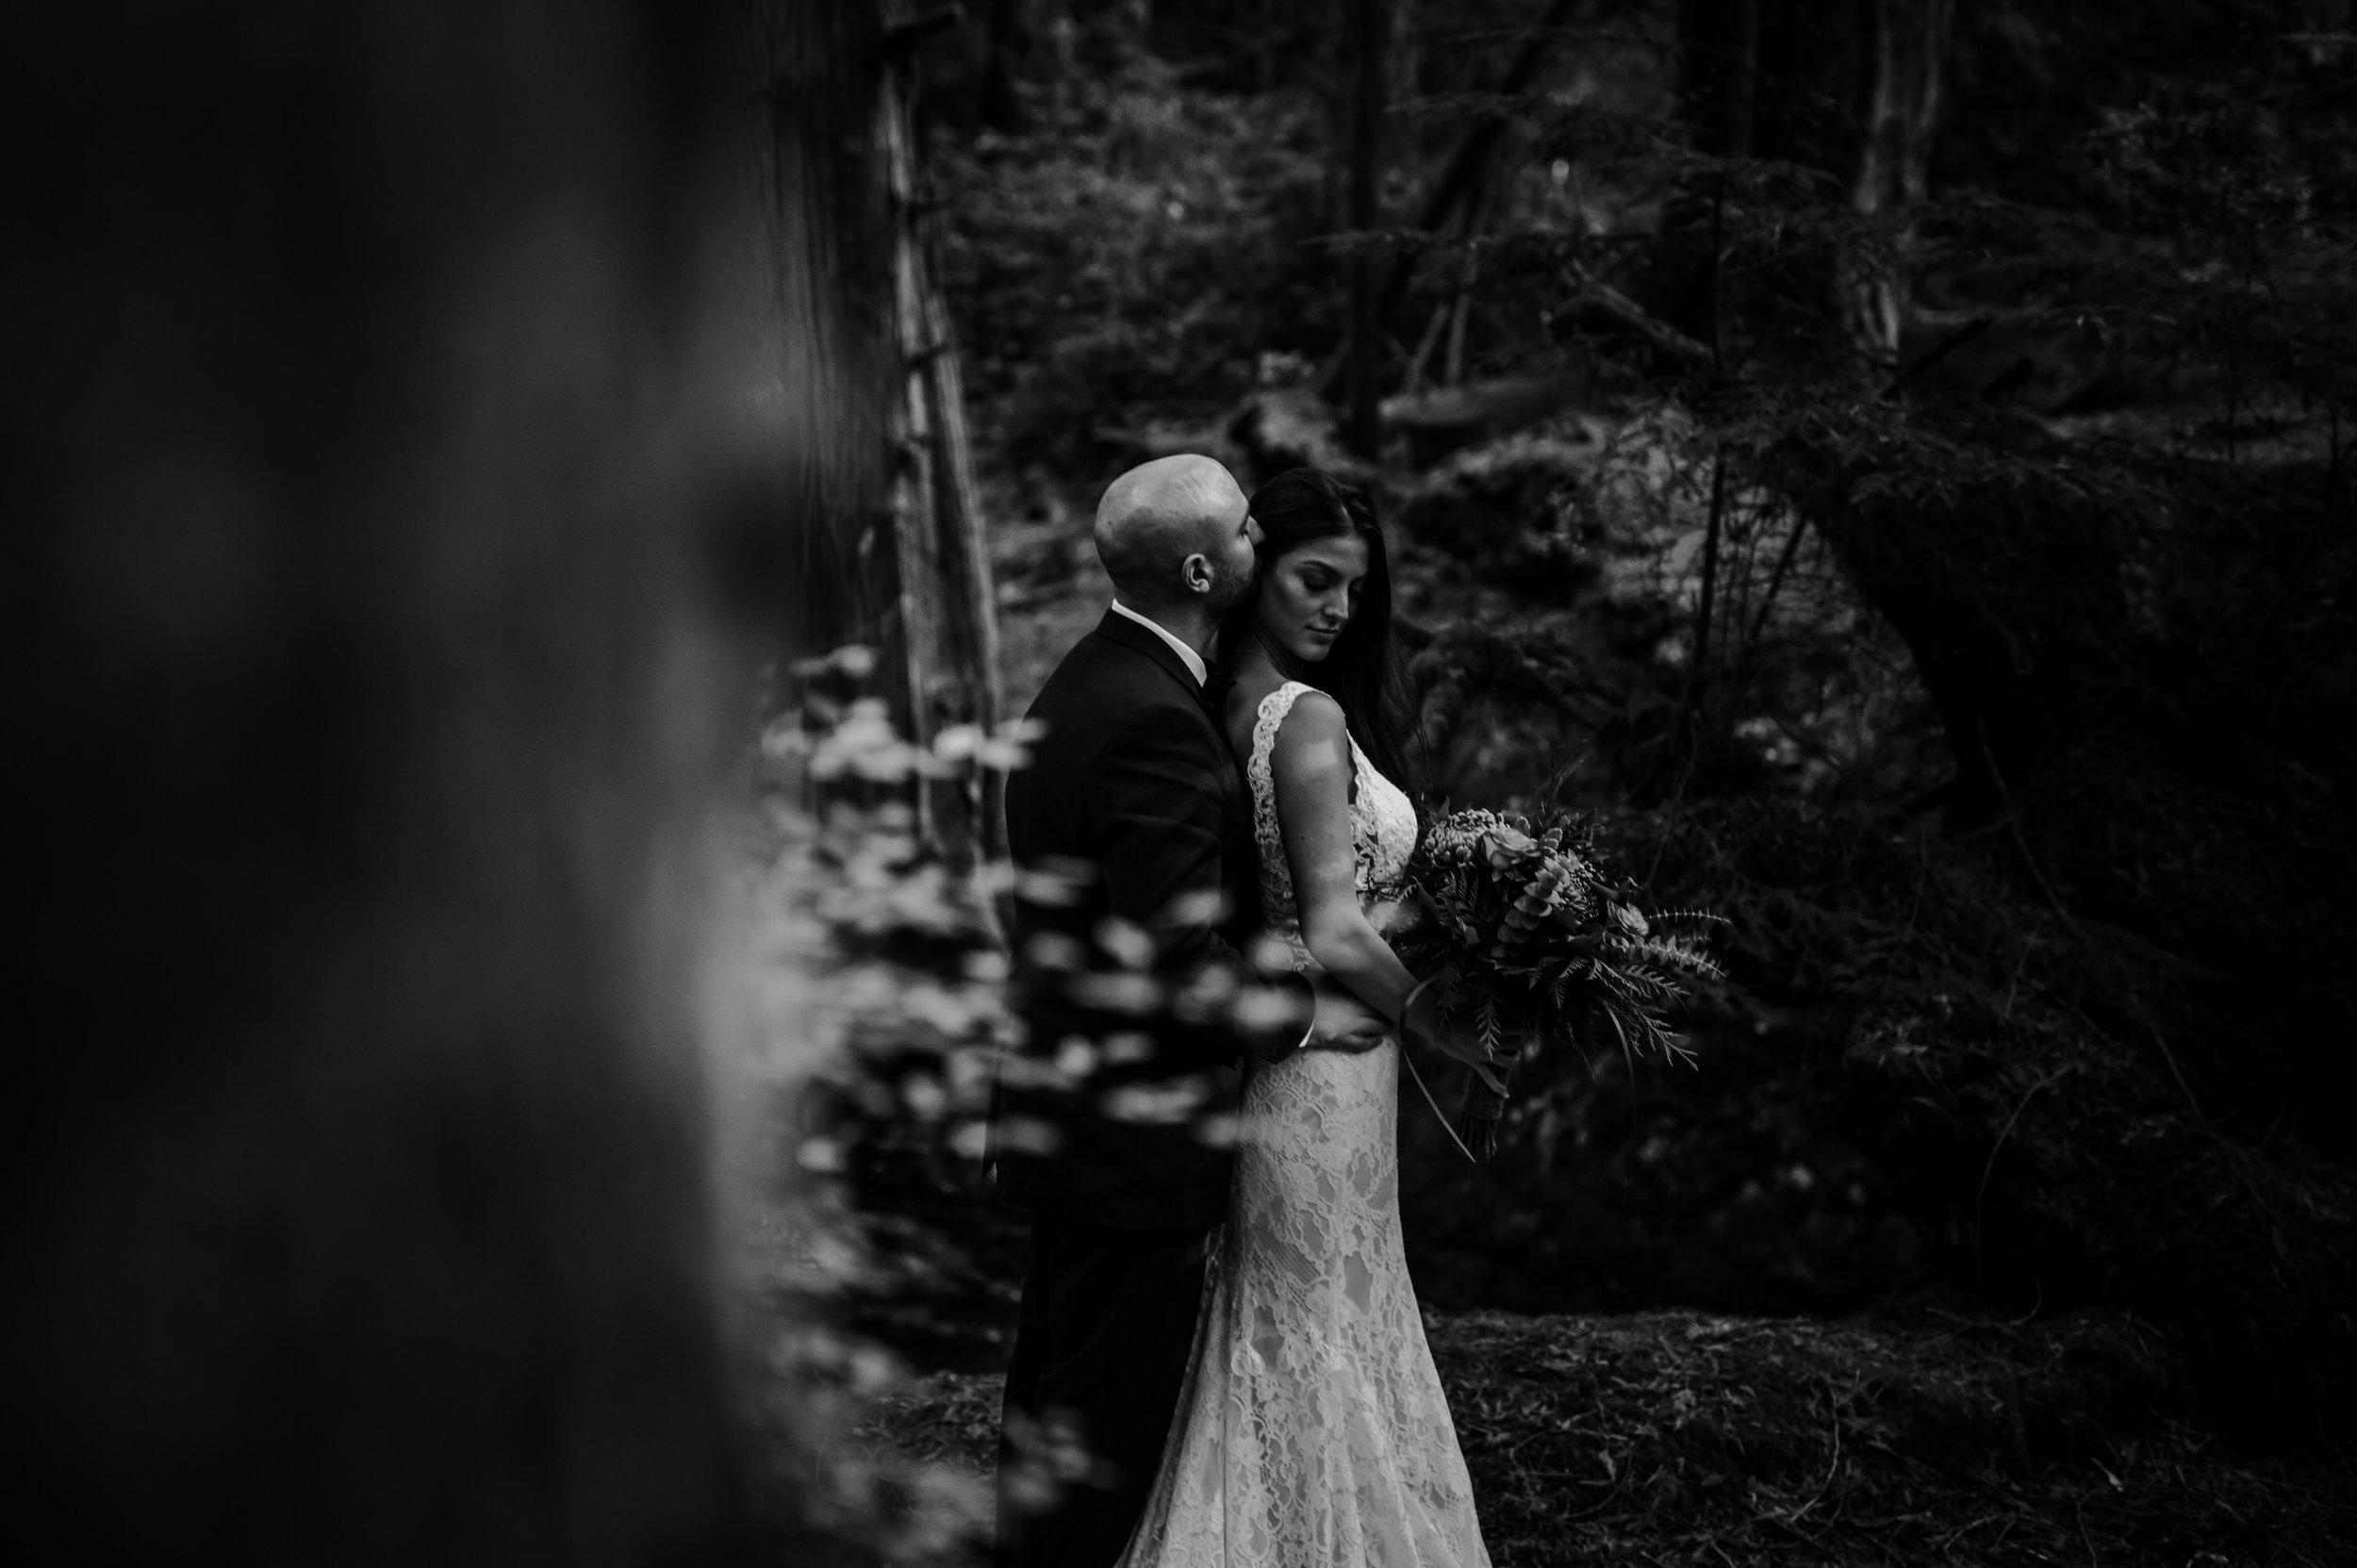 Day After Wedding Photos - Sunshine Coast Wedding Photos - Sunset Wedding Photos - Vancouver Wedding Photographer & Videographer - Sunshine Coast Wedding Photos - Sunshine Coast Wedding Photographer - Jennifer Picard Photography - 1A5A7502-2.jpg